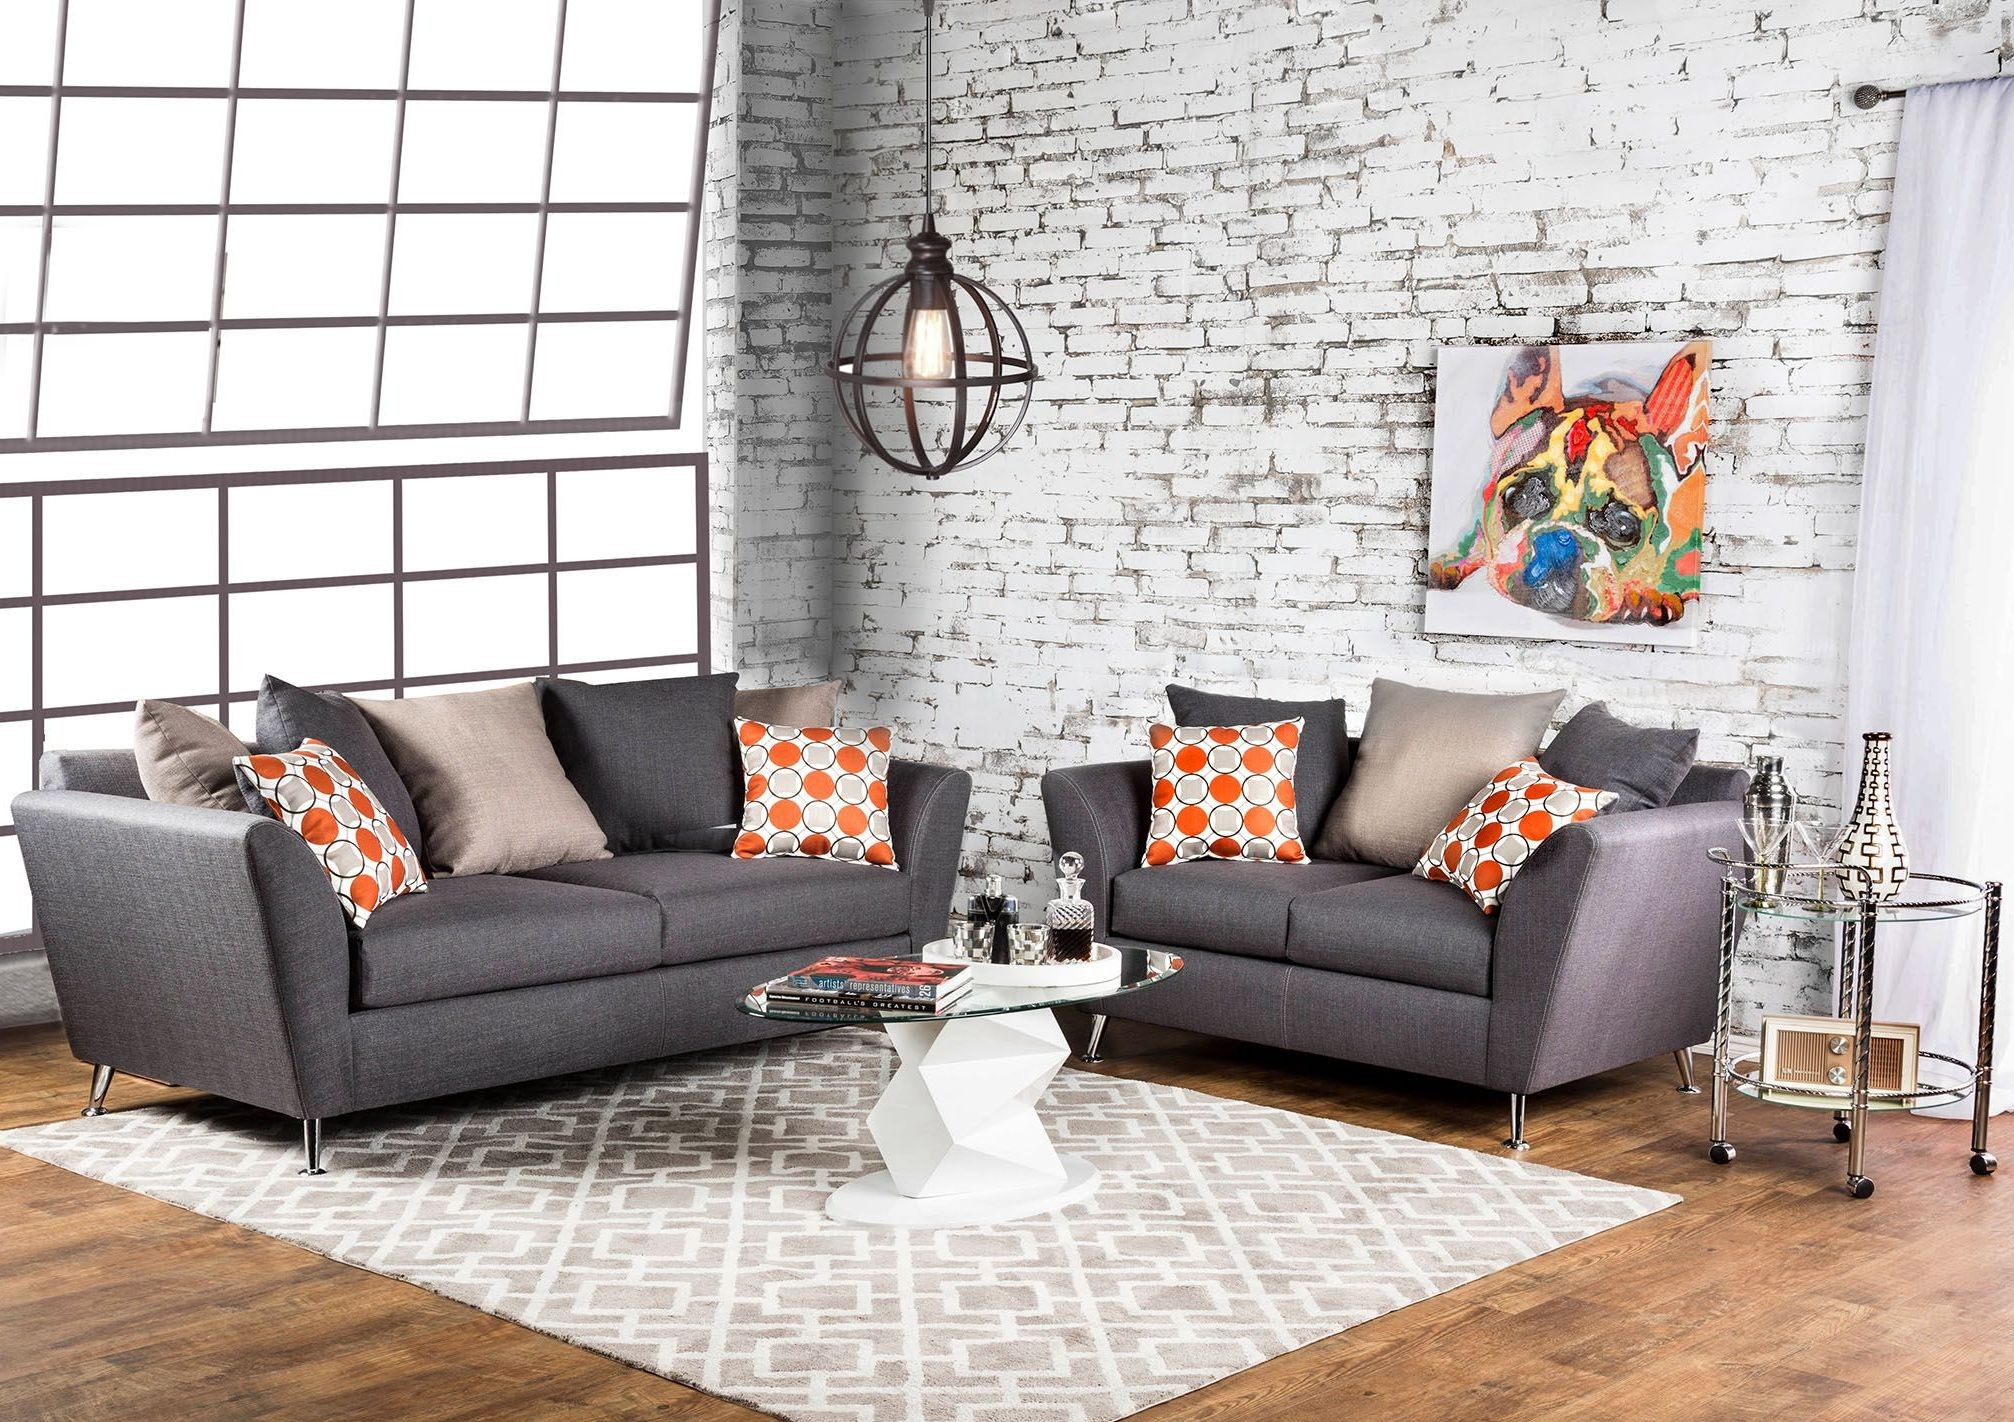 Belfield Gray Living Room Set from Furniture of America | Coleman ...